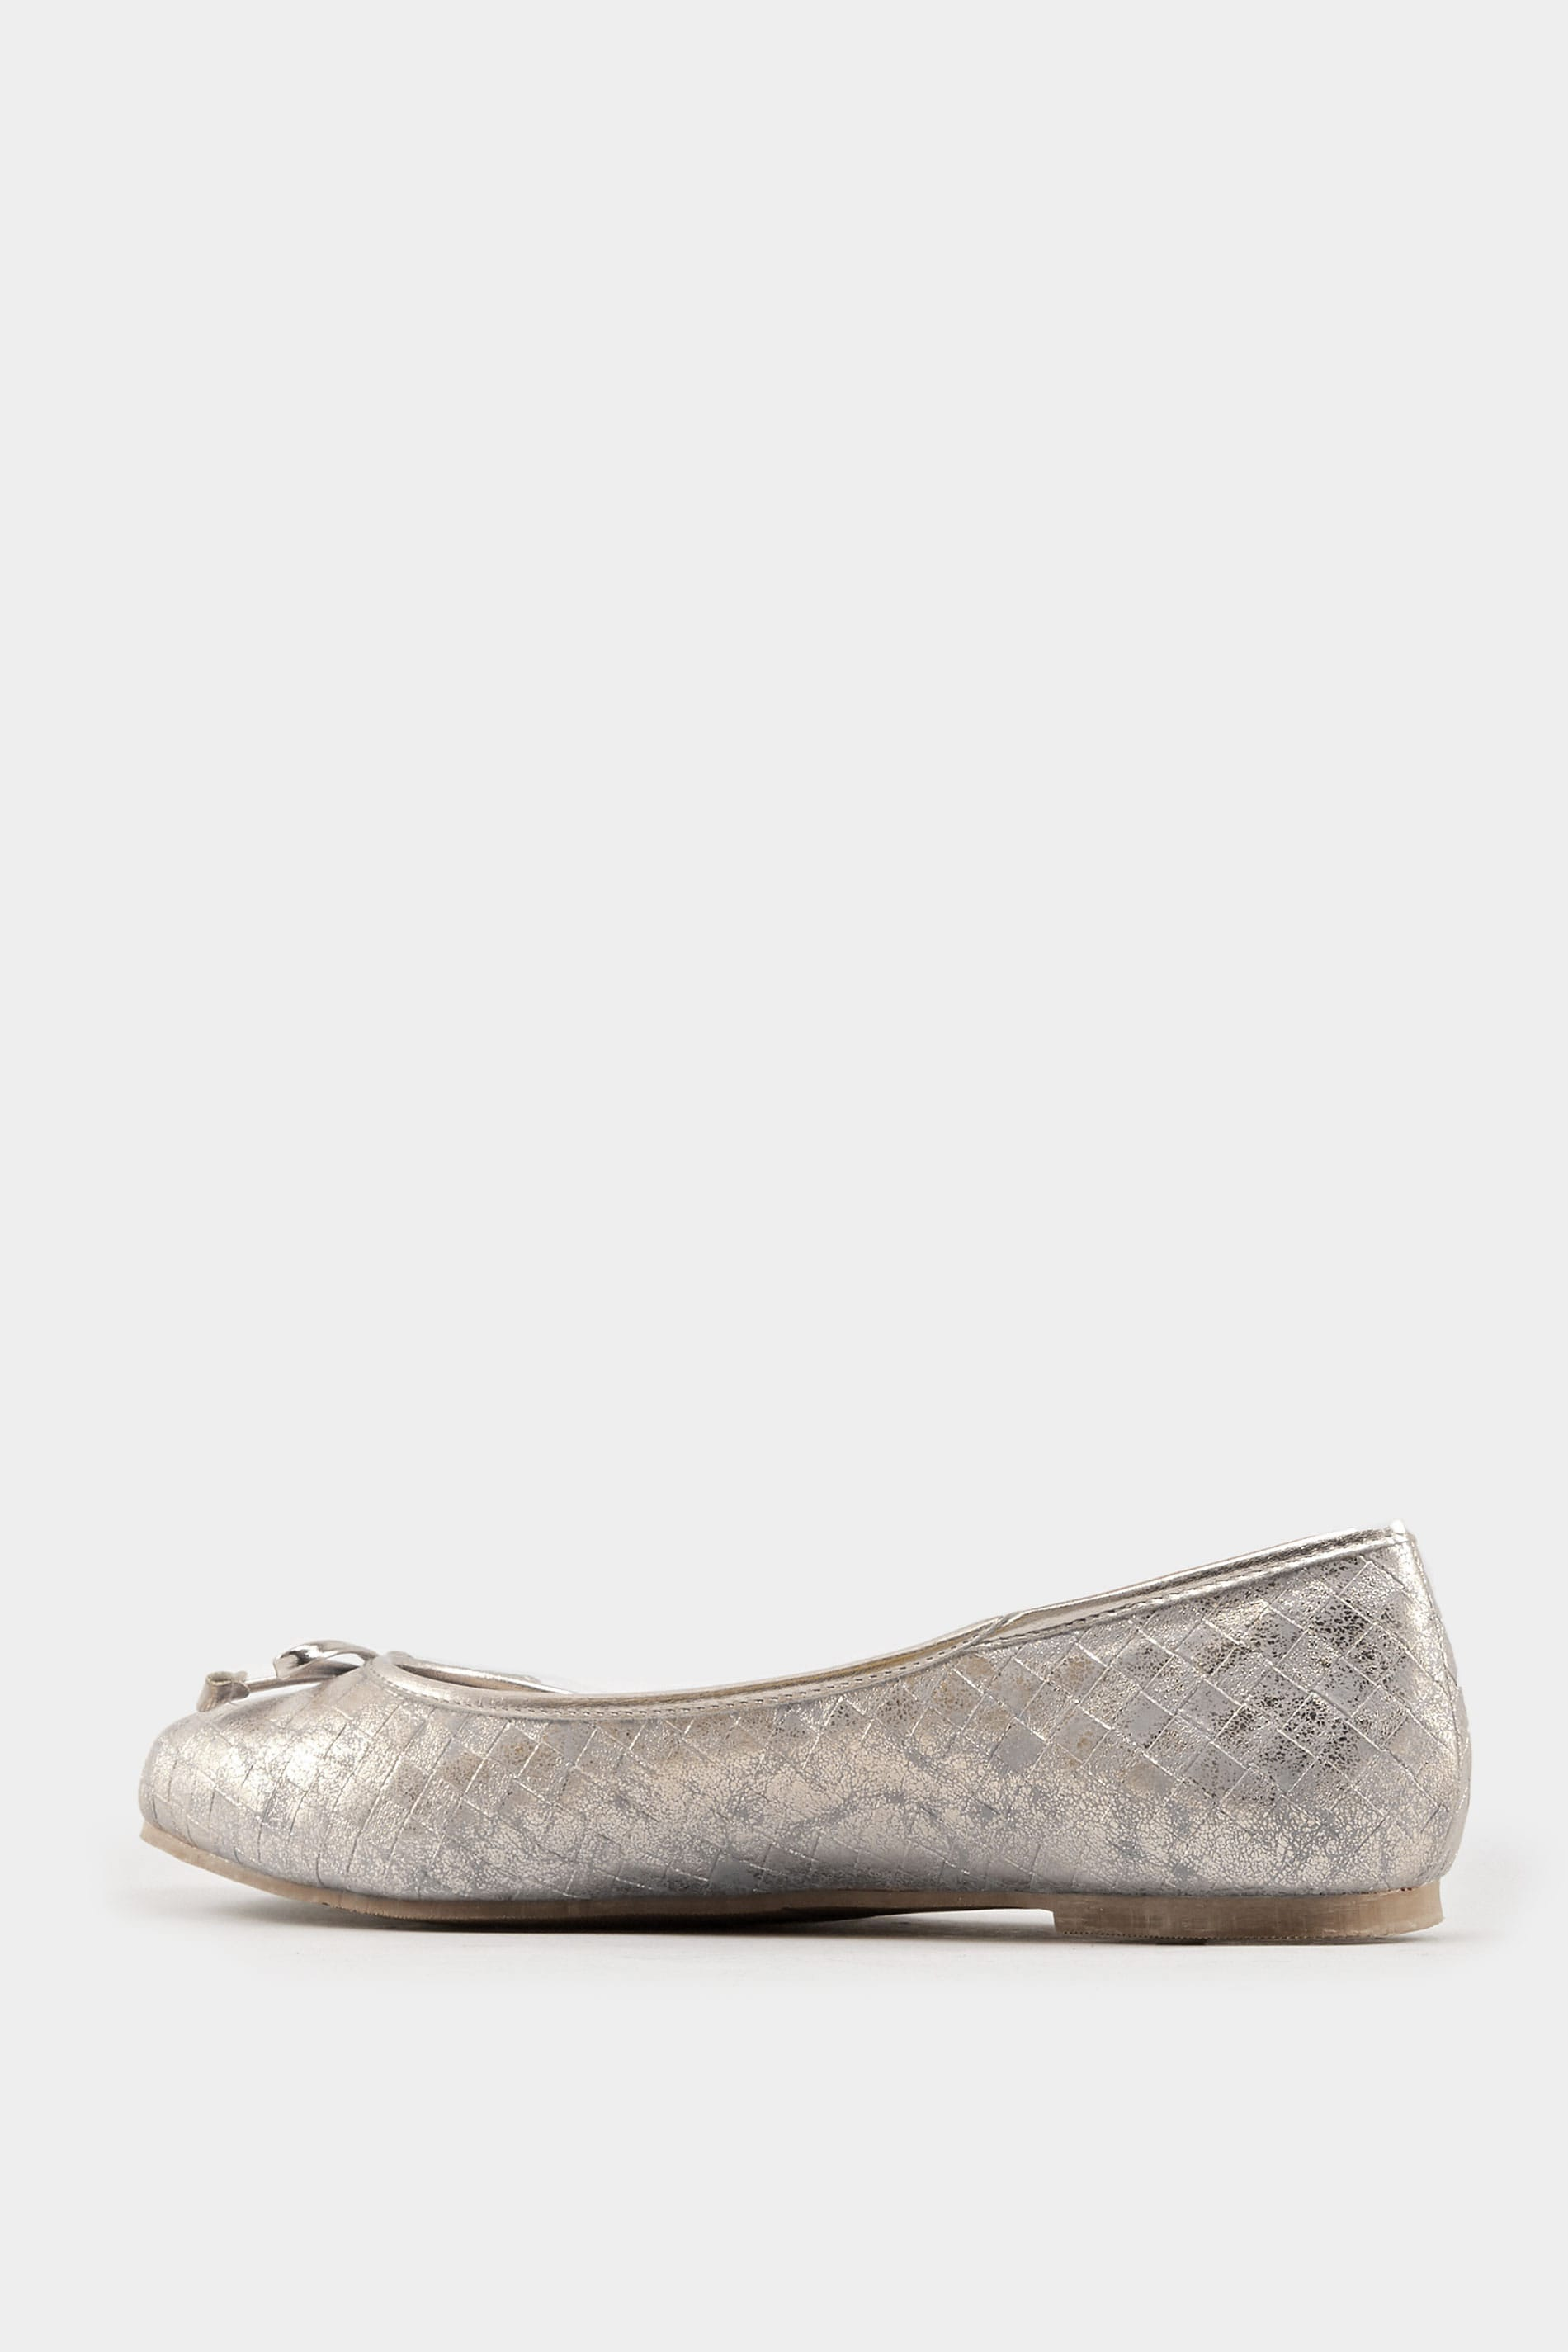 Silver Textured Ballerina Pumps In